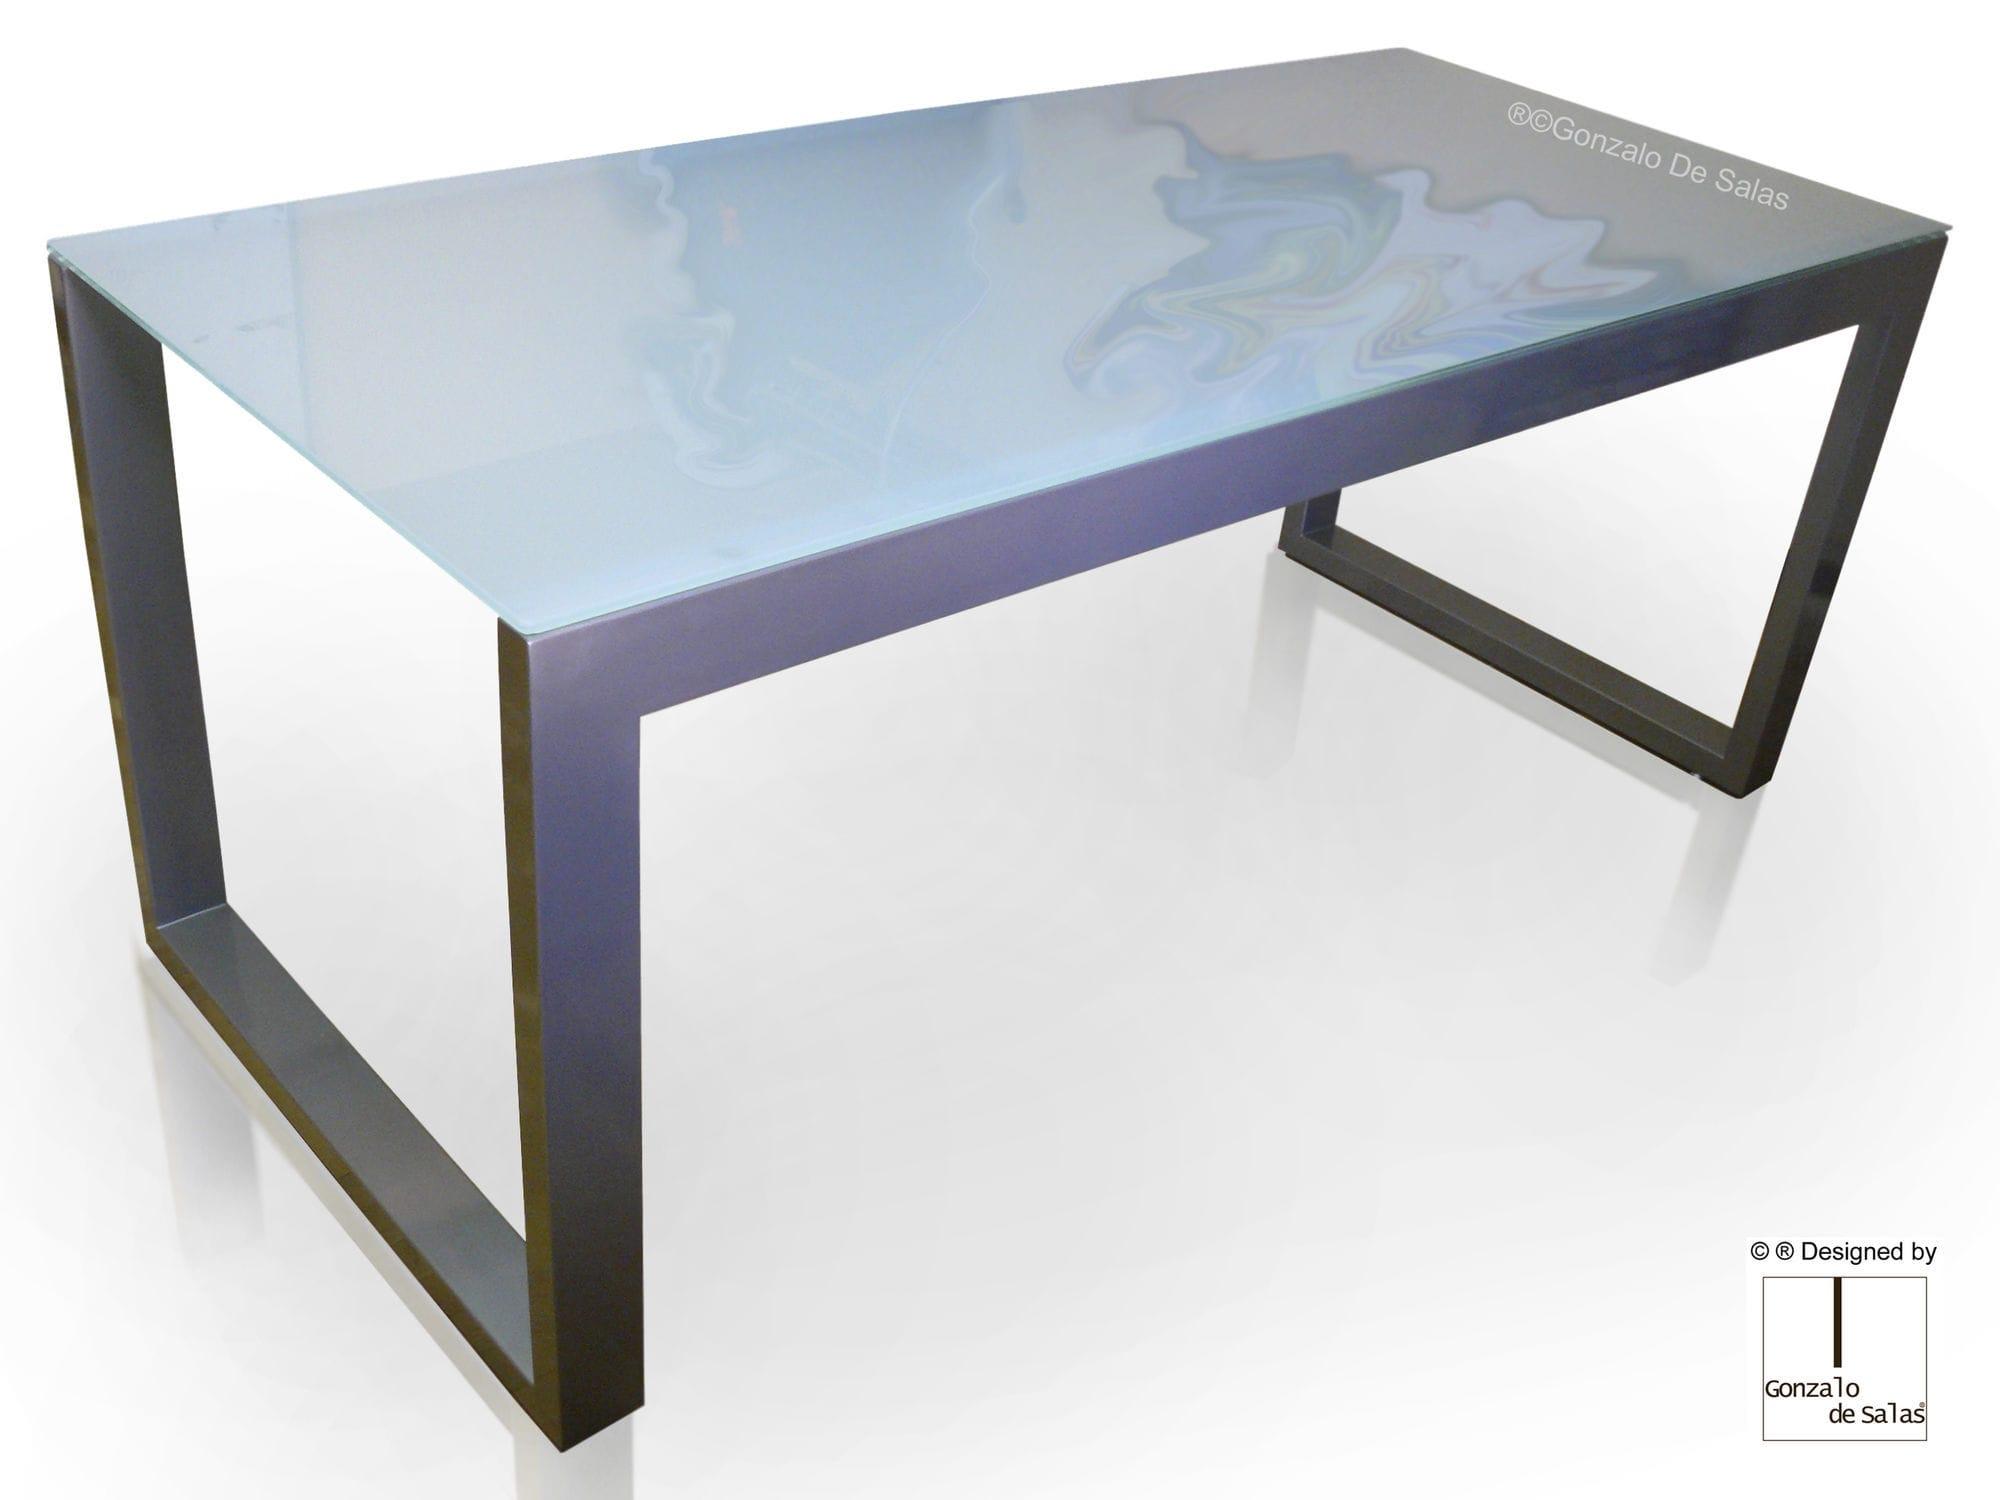 glass desk maza gonzalo de salas